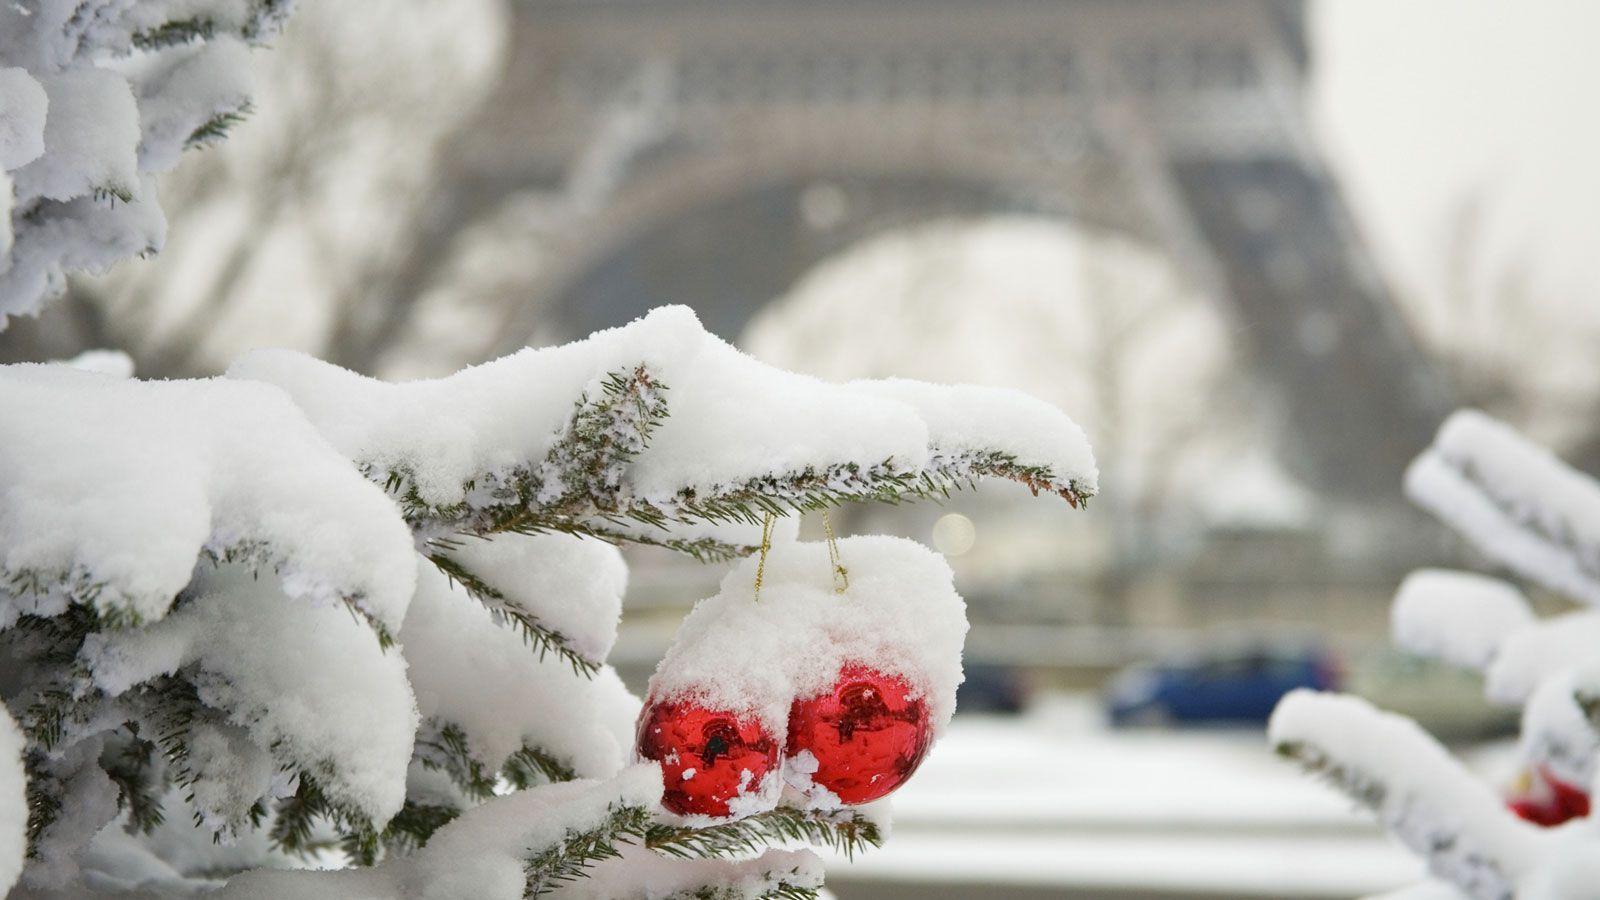 Christmas In Europe Wallpaper.France Christmas Wallpapers Top Free France Christmas